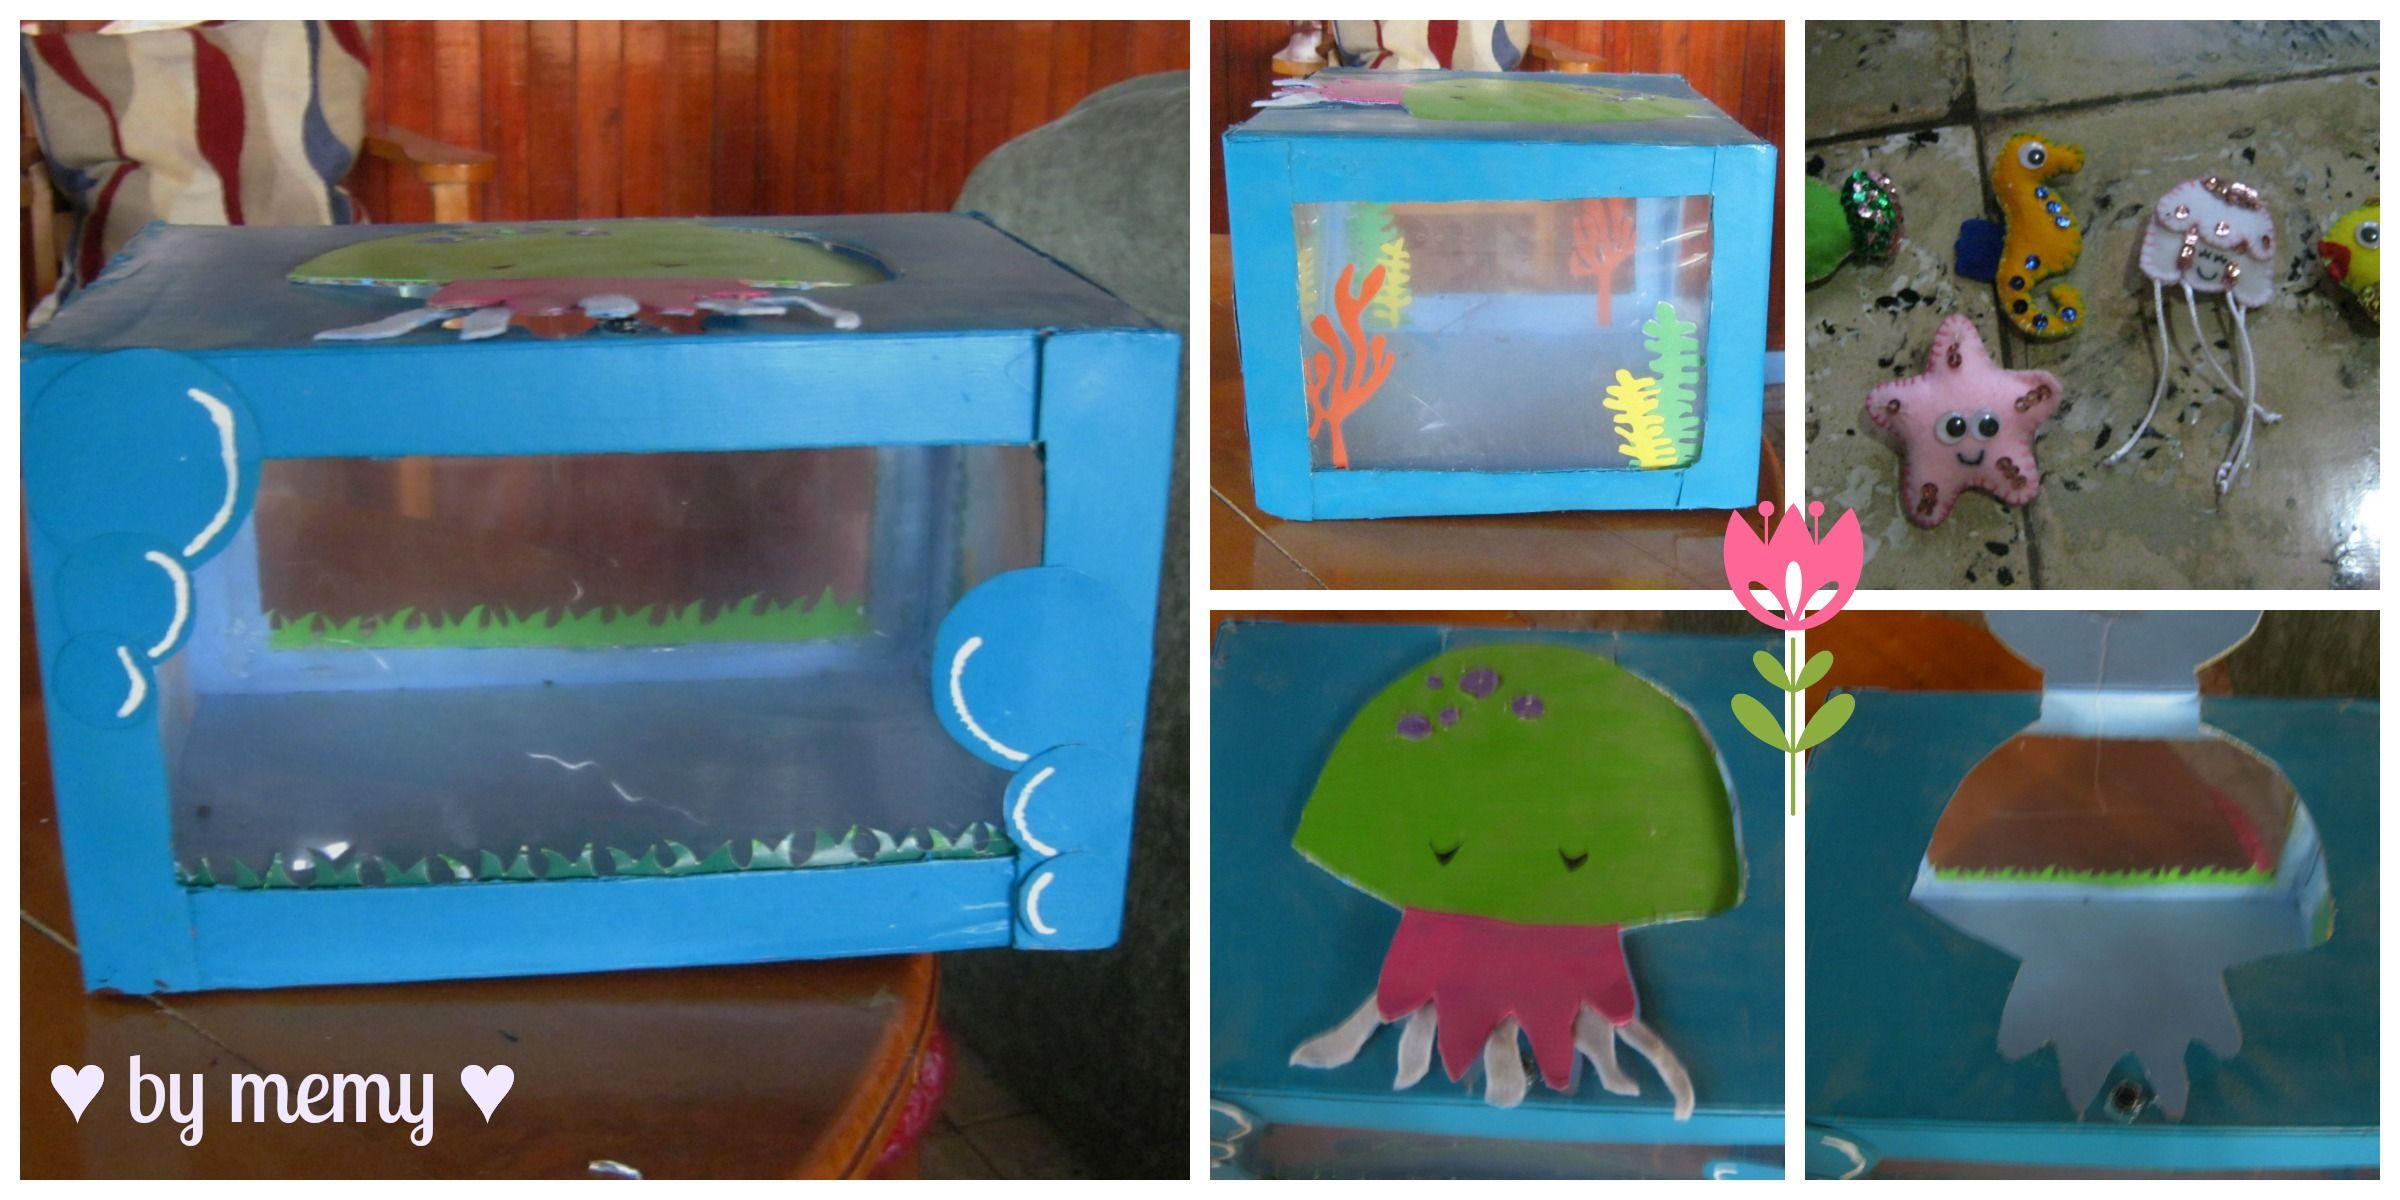 Pecera Hecha Con Material Reciclable Manualidades Para Niños Pequeños Manualidades Infantiles Manualidades